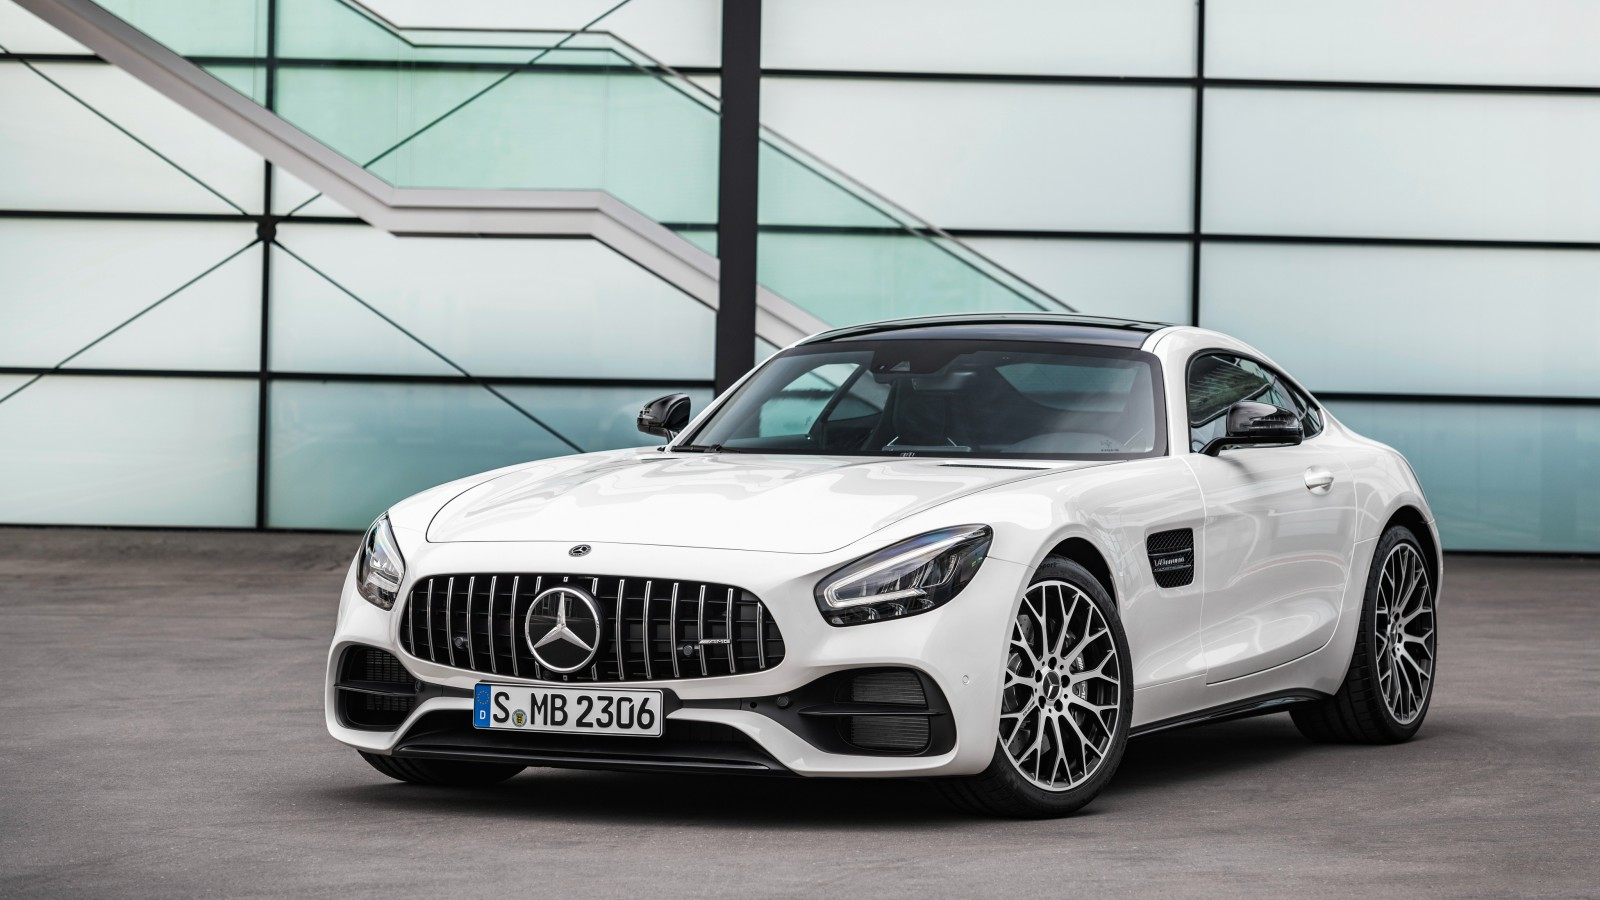 Mercedes Amg Gt Wallpaper: Mercedes-AMG GT 2019 4K Wallpaper